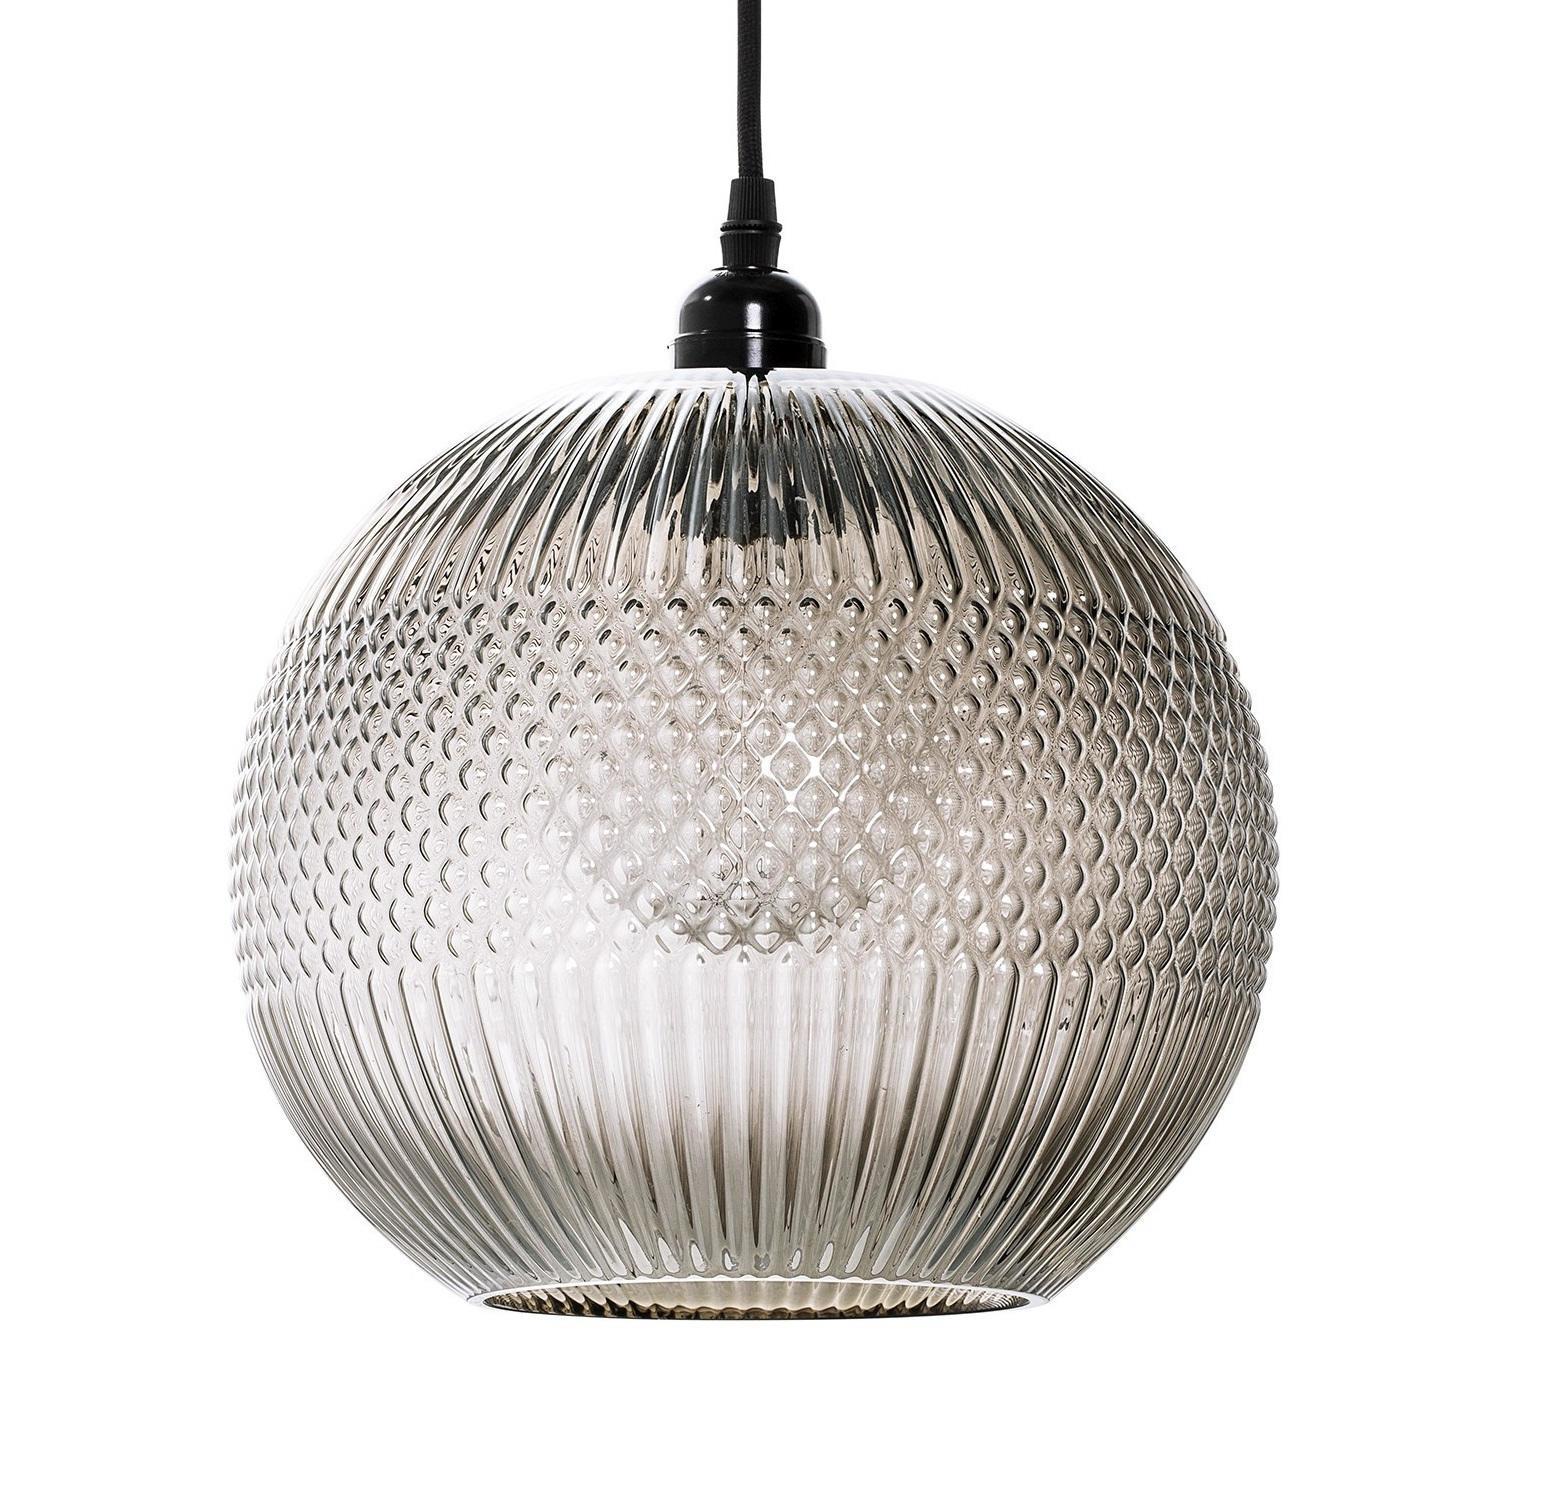 Bloomingville Skleněný lustr Ball Brown, šedá barva, hnědá barva, čirá barva, sklo